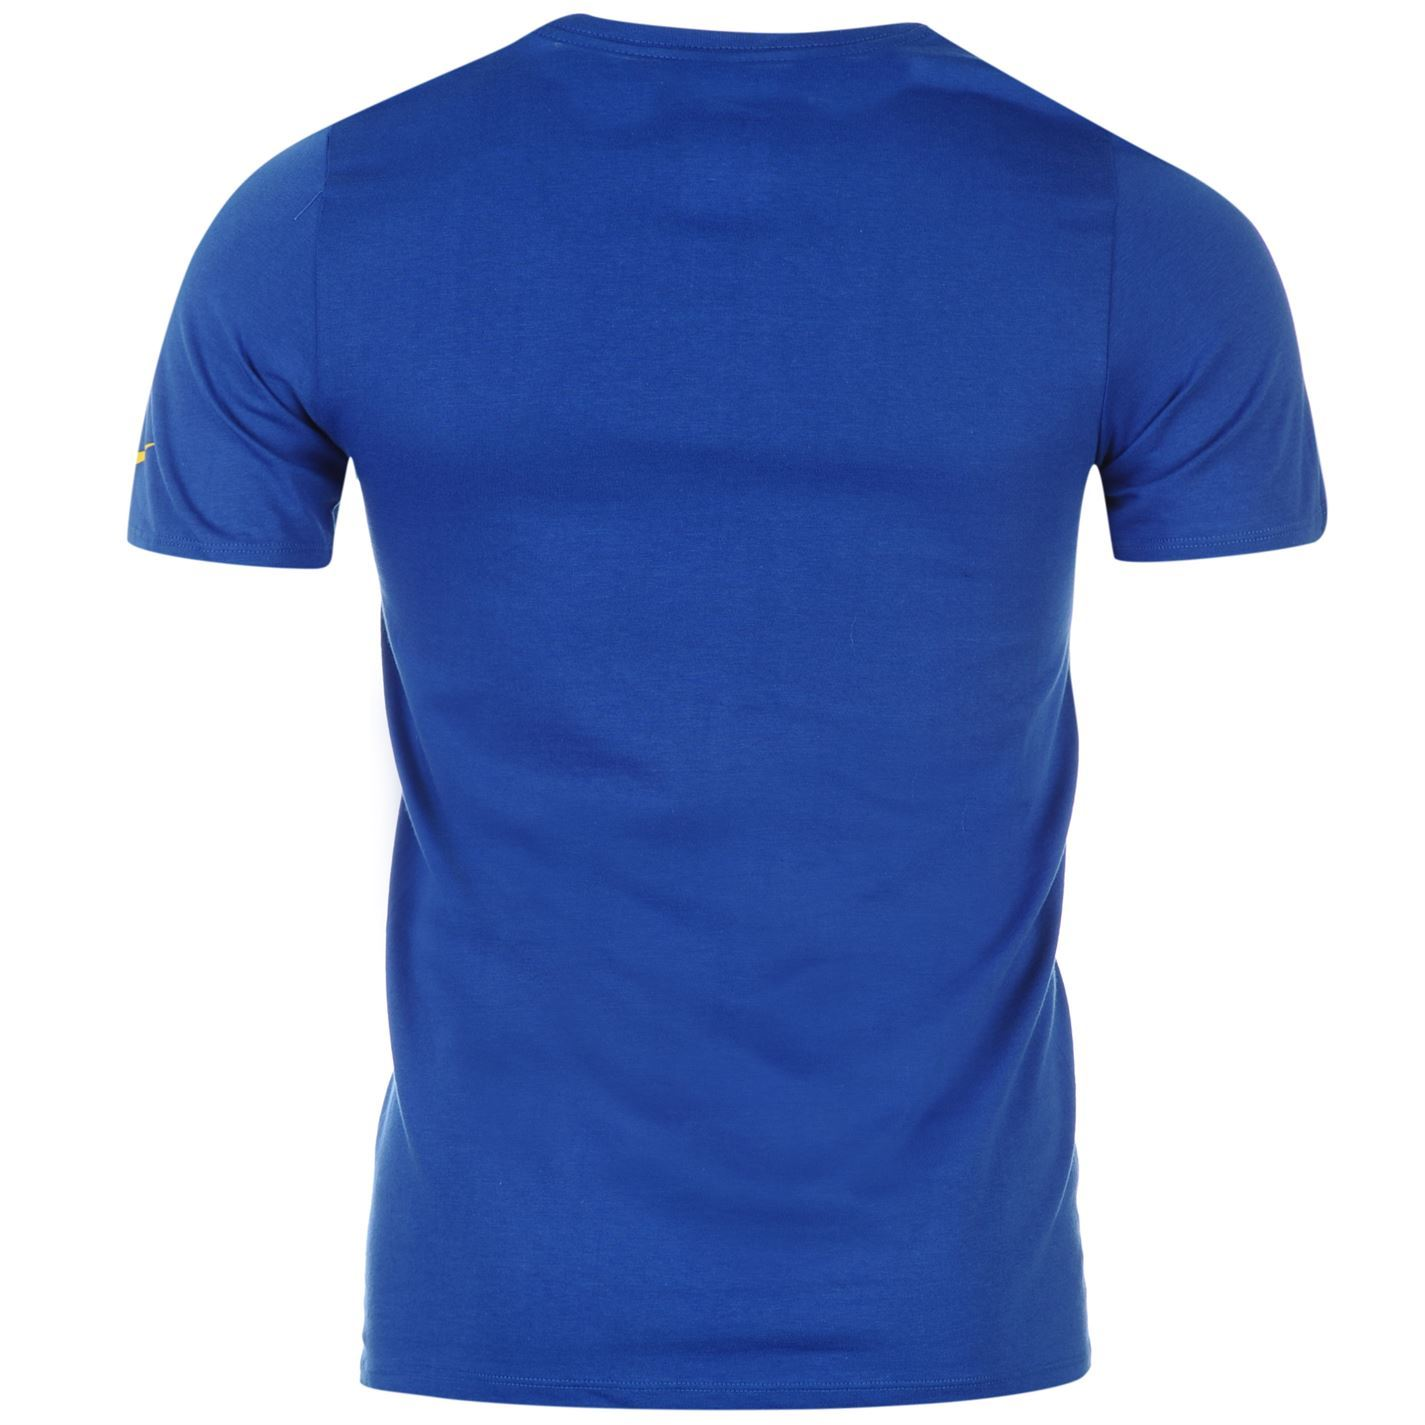 Nike just do it rip qtt t shirts mens royal top tee shirt for Nike just do it t shirt women s